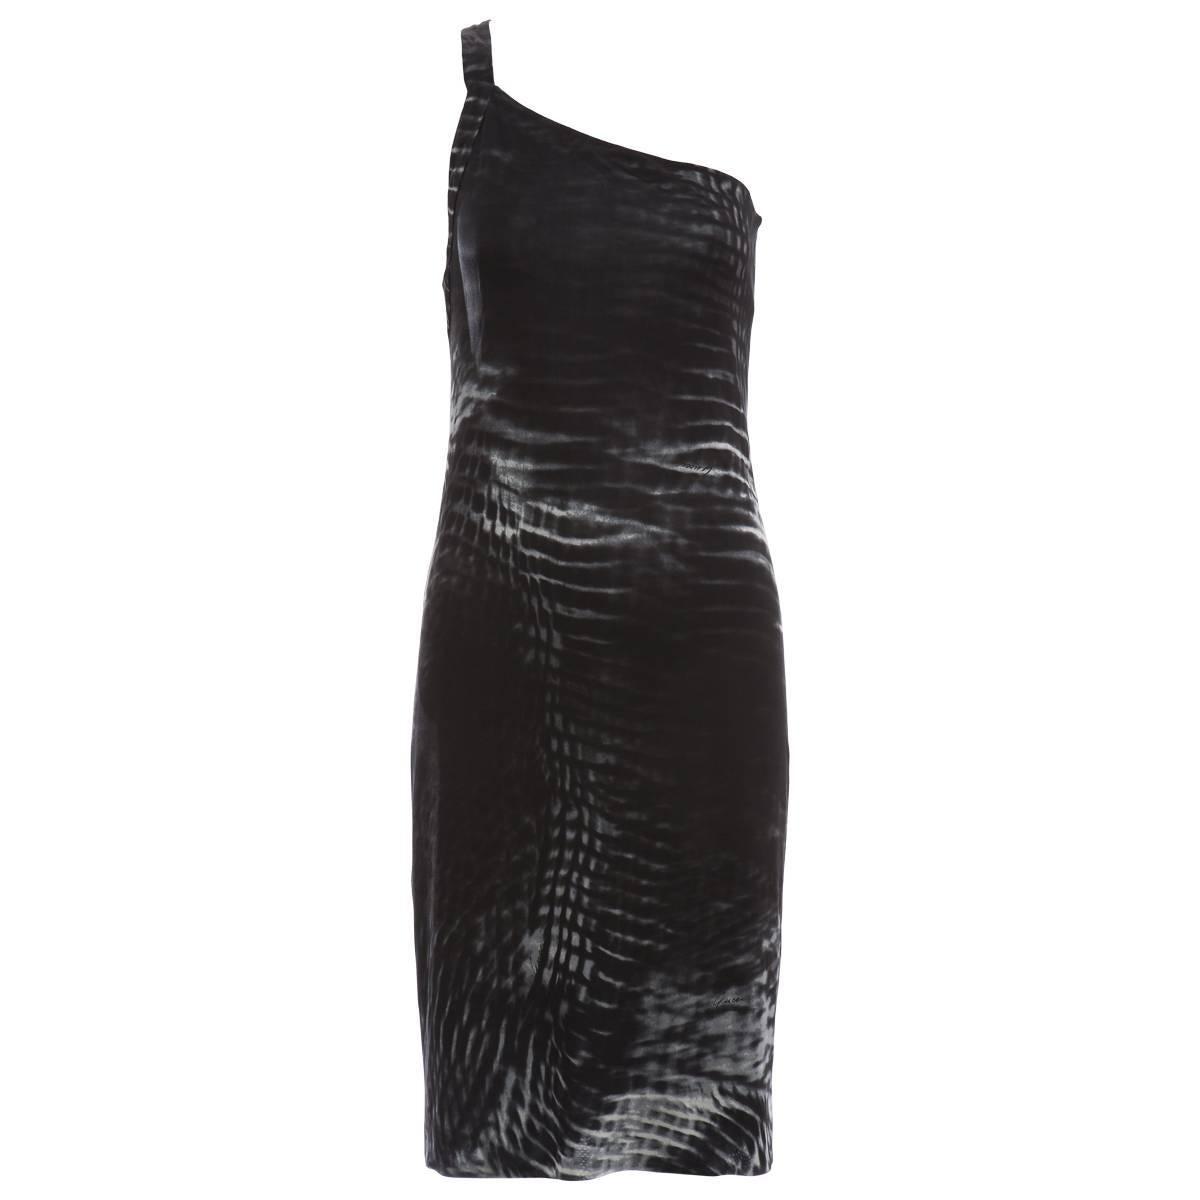 Tom Ford for Gucci Runway Black One-Shoulder Printed Dress , Spring 2000